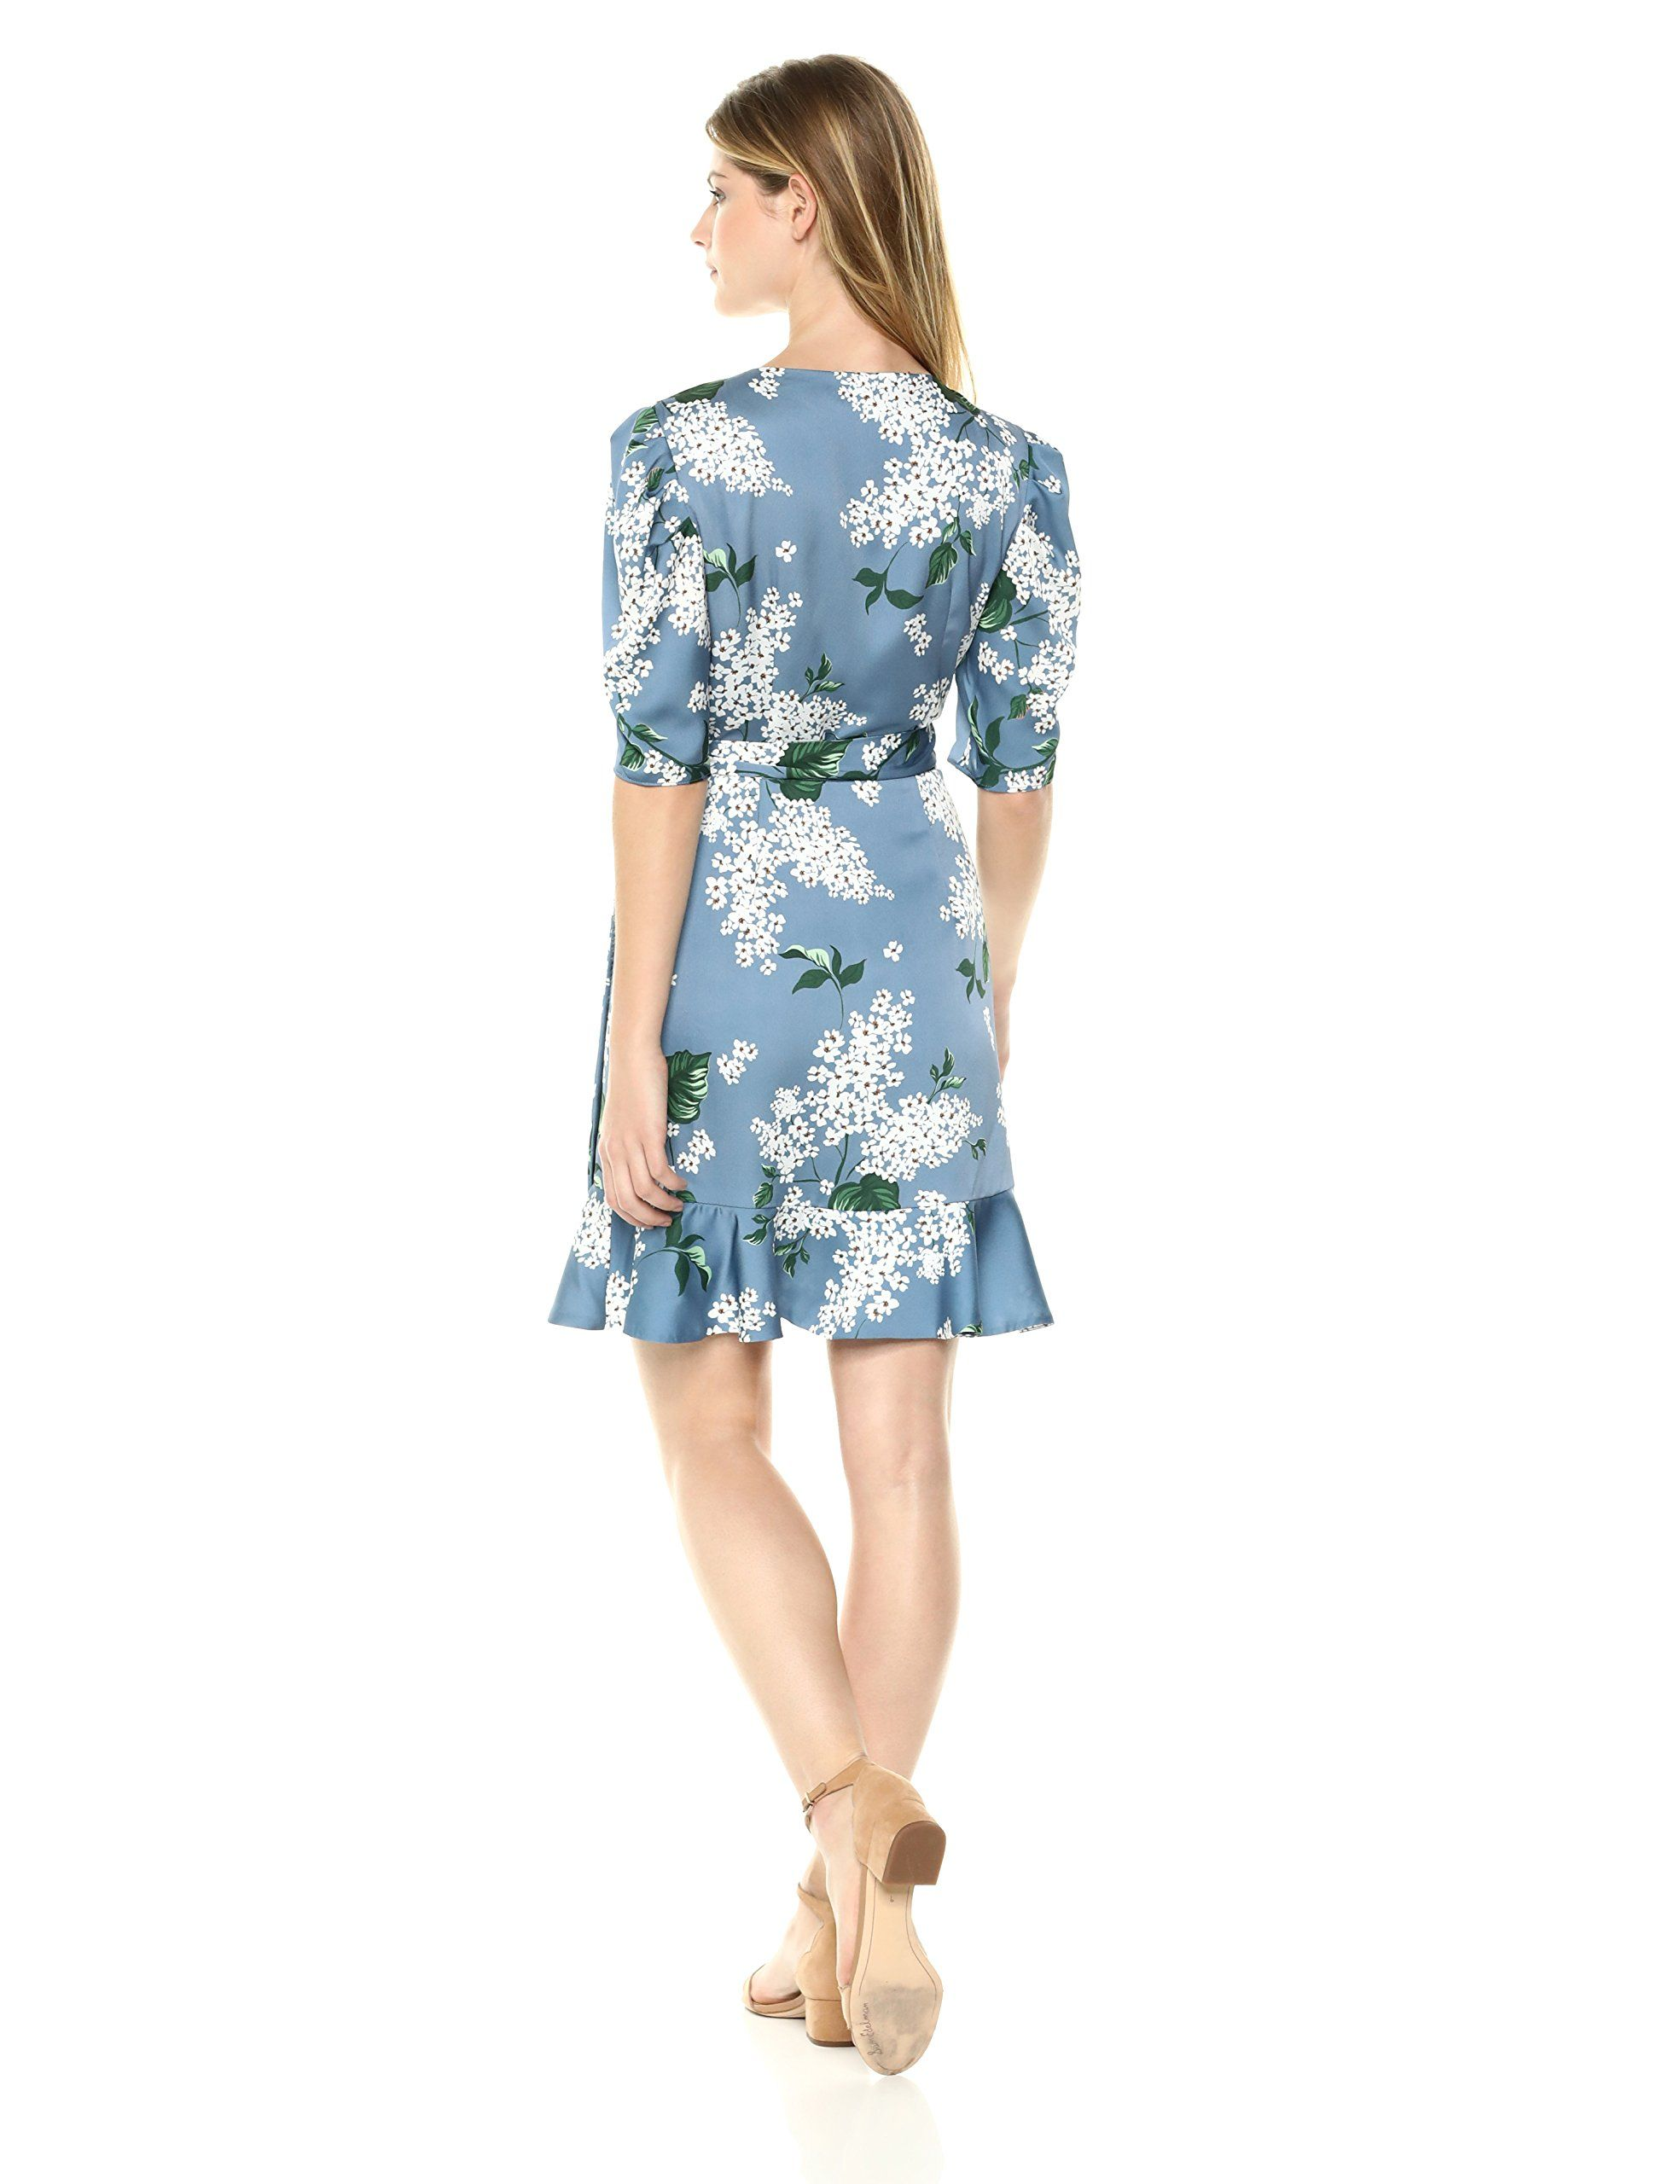 Keepsake The Label Womens This Moment Short Sleeve Ruffle Mini Wrap Dress Dusty Blue Floral Xl Wish To Know More Click T Mini Wrap Dress Wrap Dress Dresses [ 2560 x 1969 Pixel ]